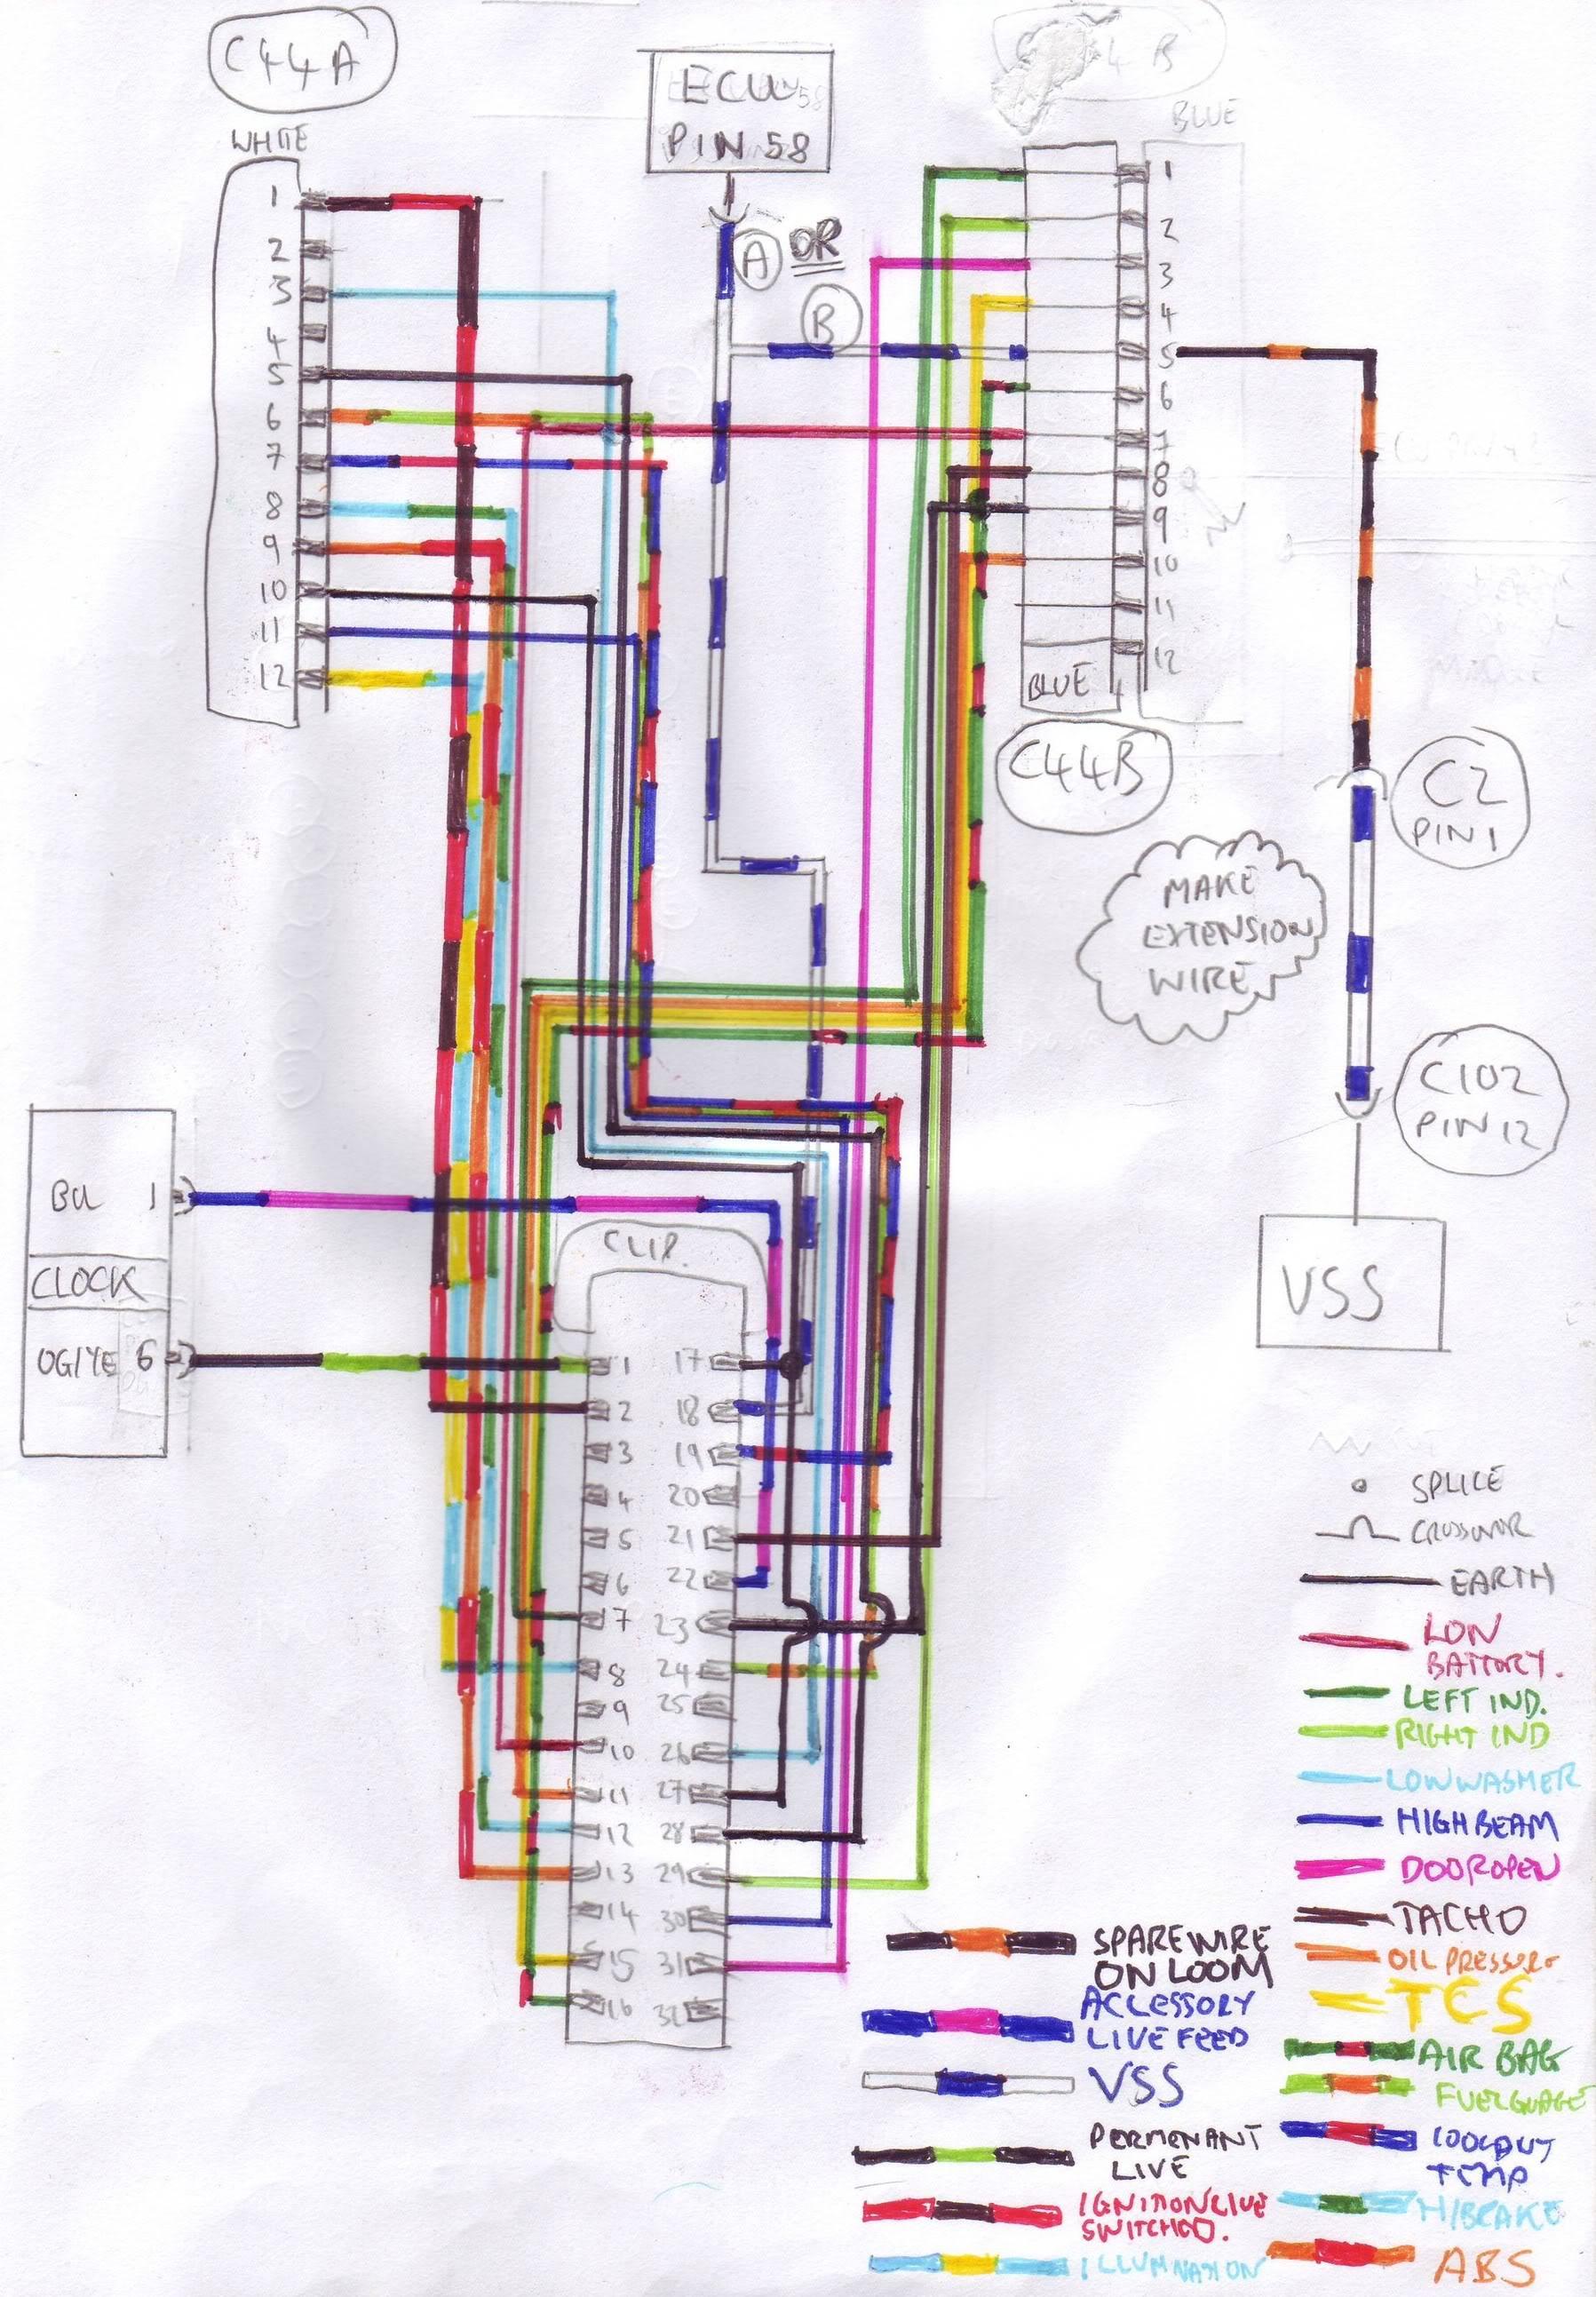 ford mondeo mk2 radio wiring diagram 5 pin din to rca plug puma cosworth restoration bodge job fix page 3